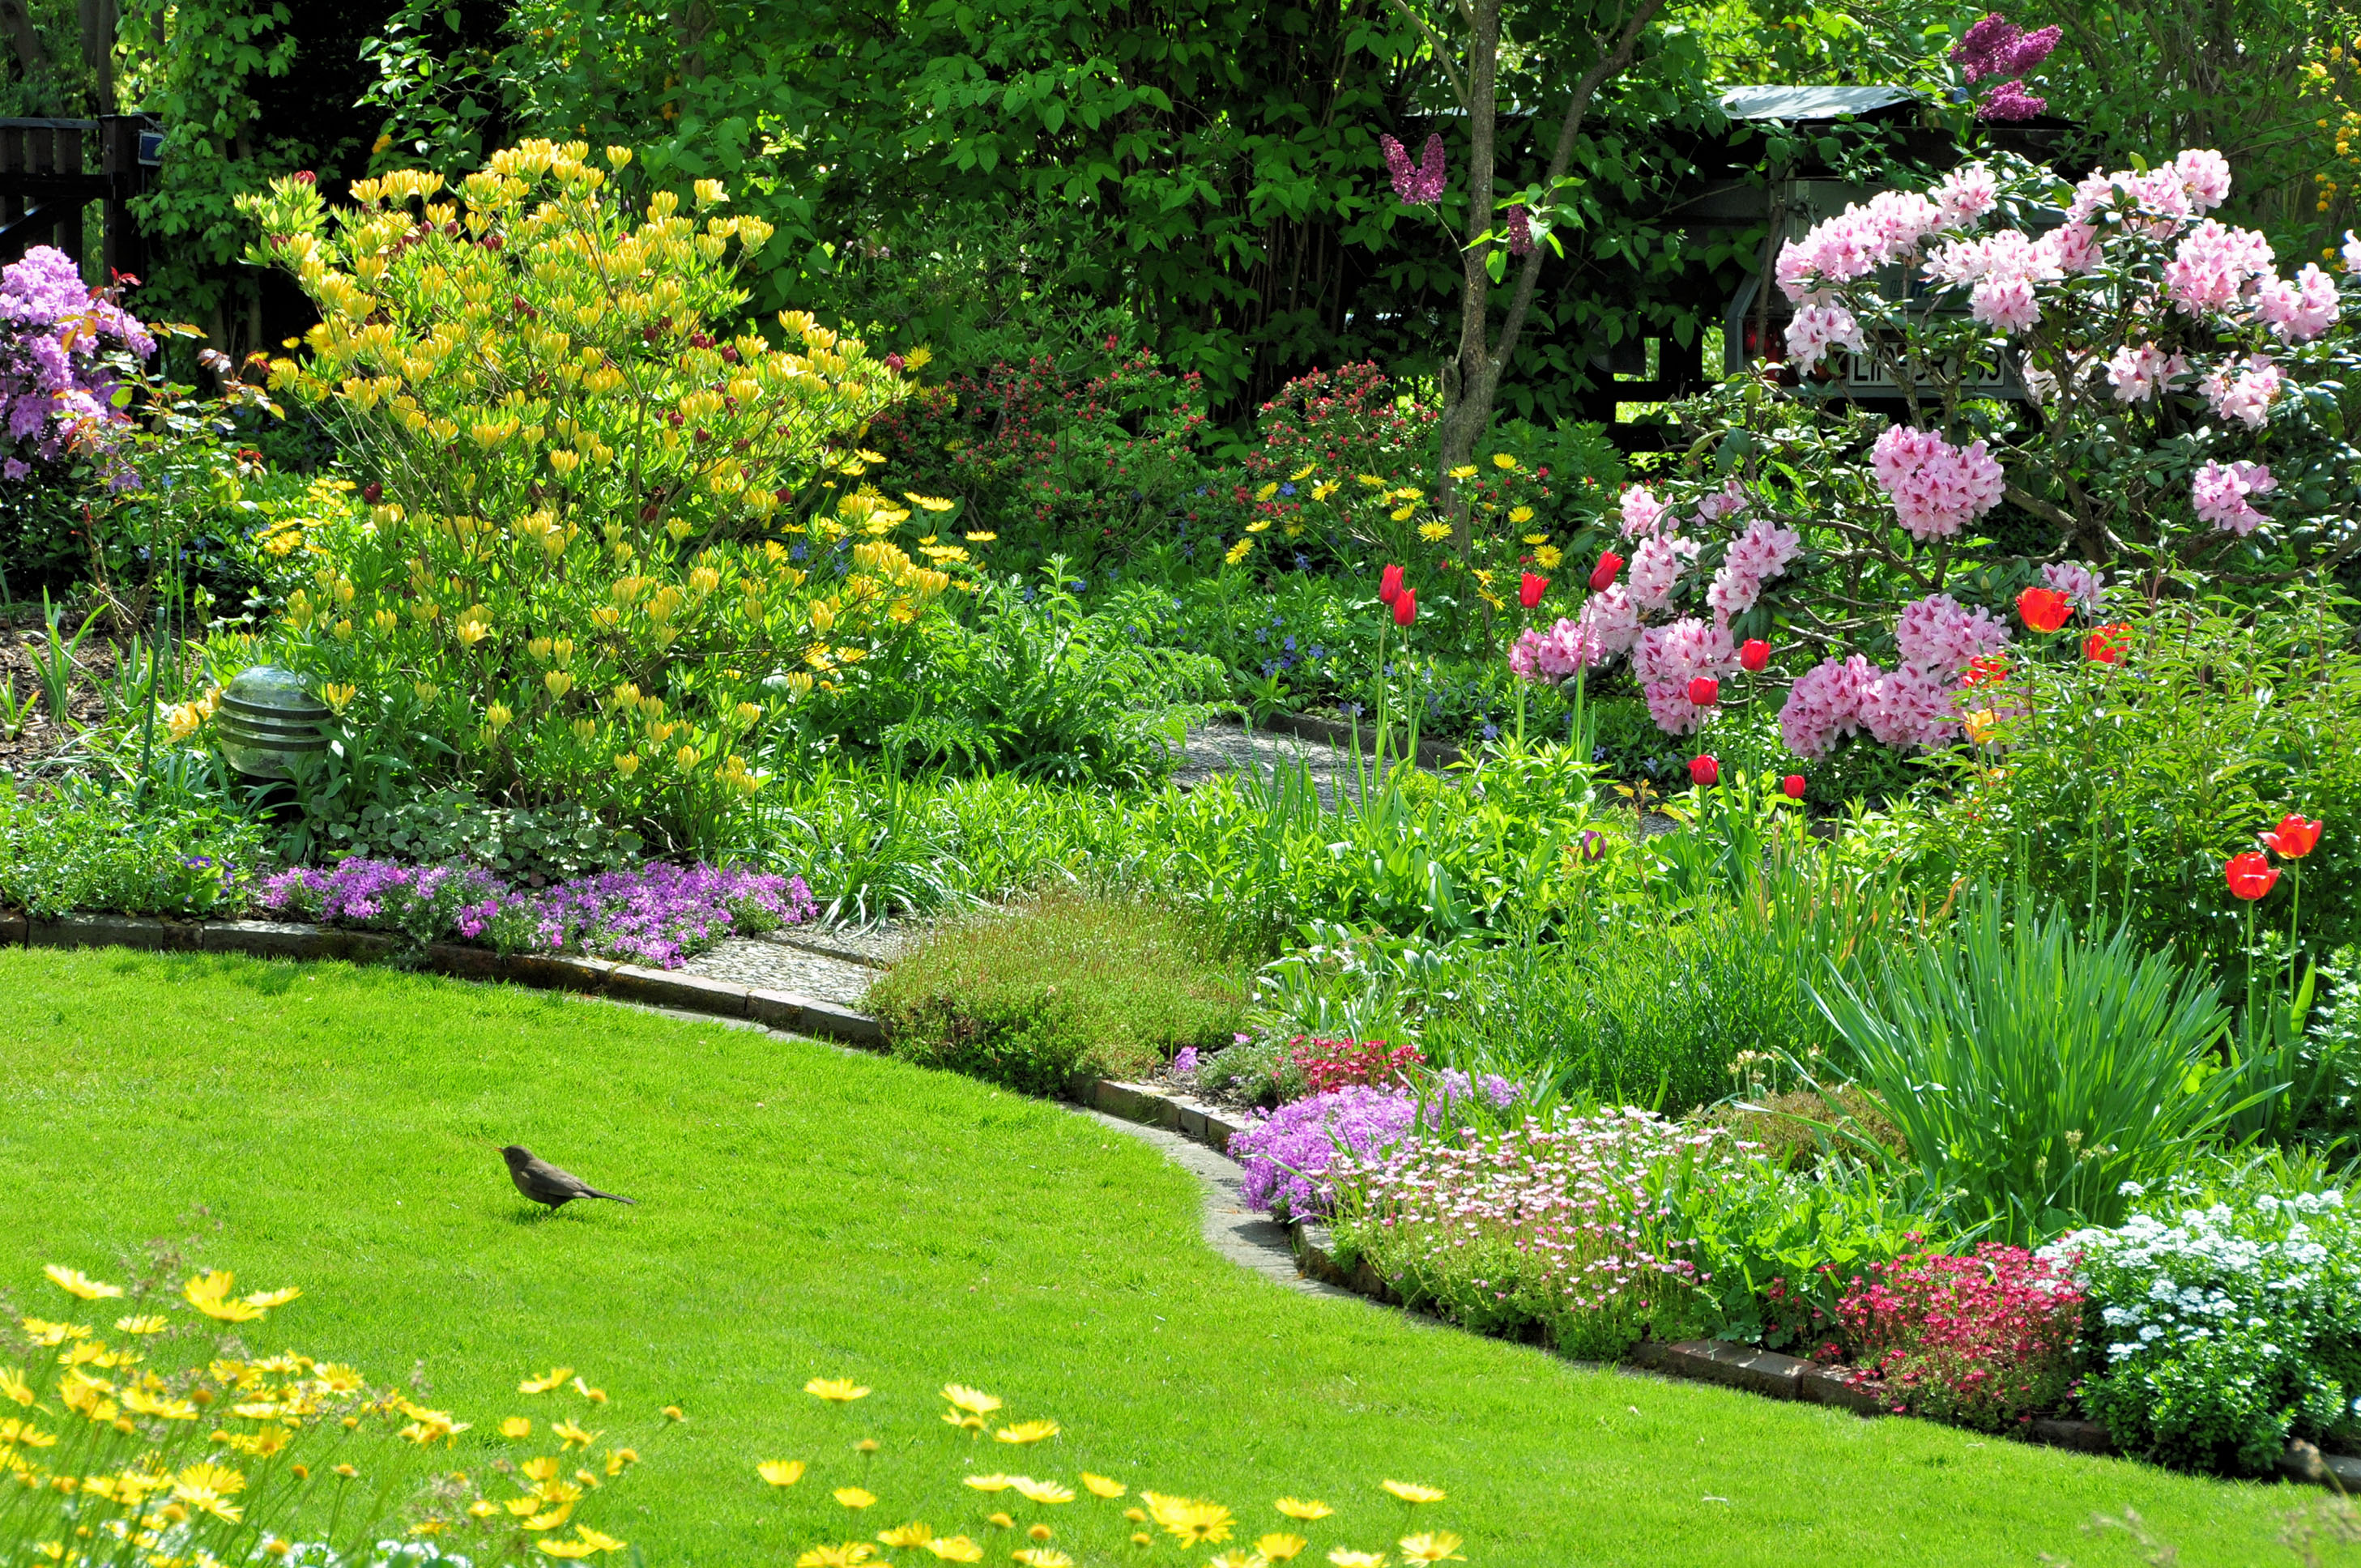 Jardin - Conseils - Les essentiels de jardinage